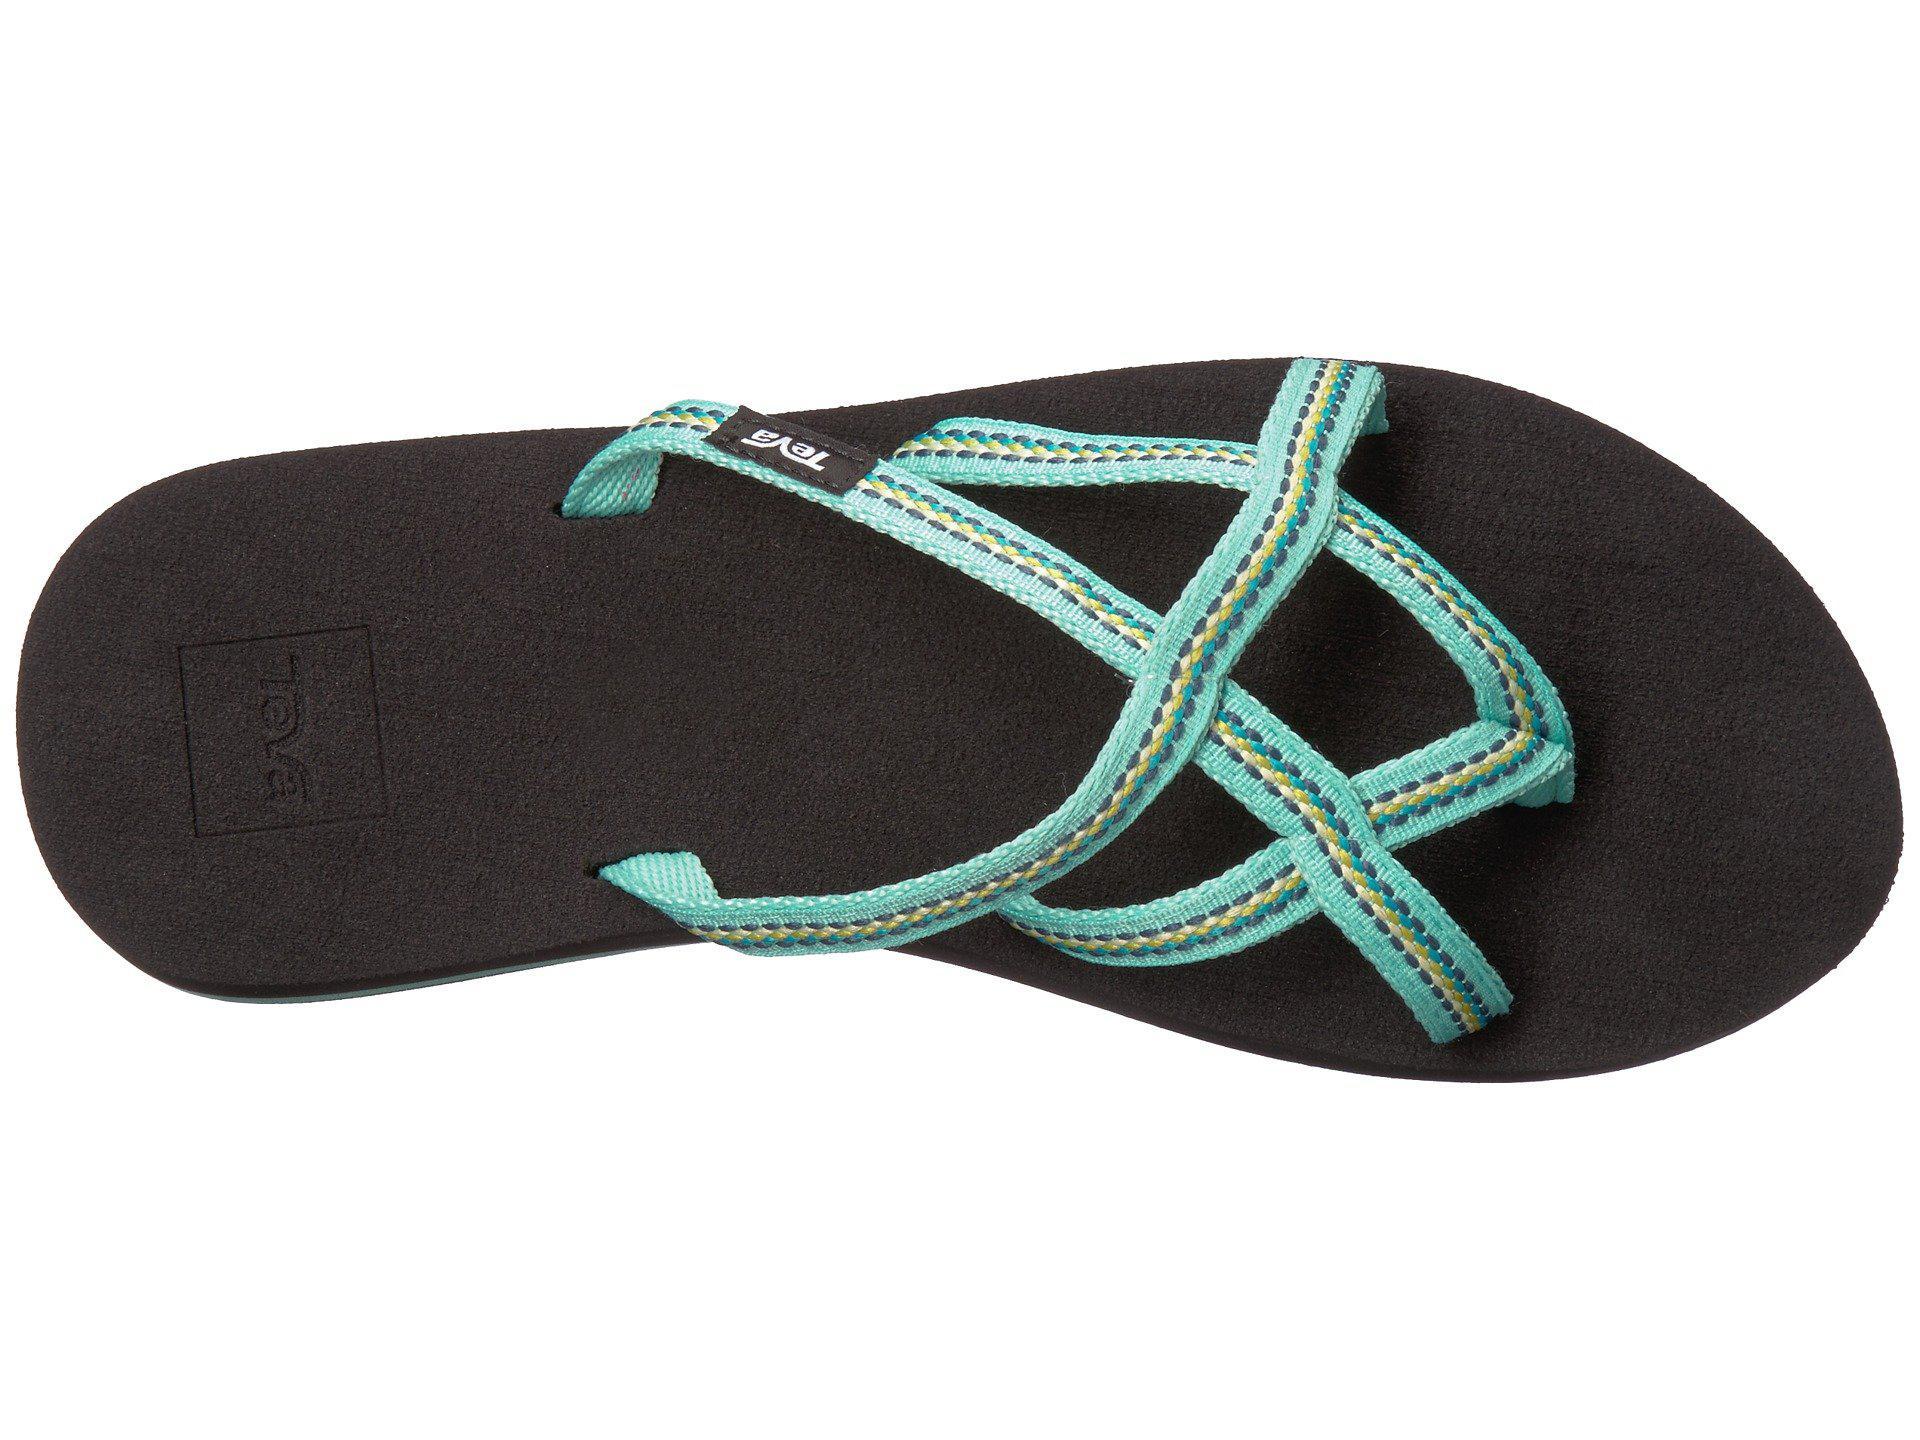 7764b0be86f933 Lyst - Teva Olowahu 2-pack (mbob lindi Seaglass) Women s Sandals